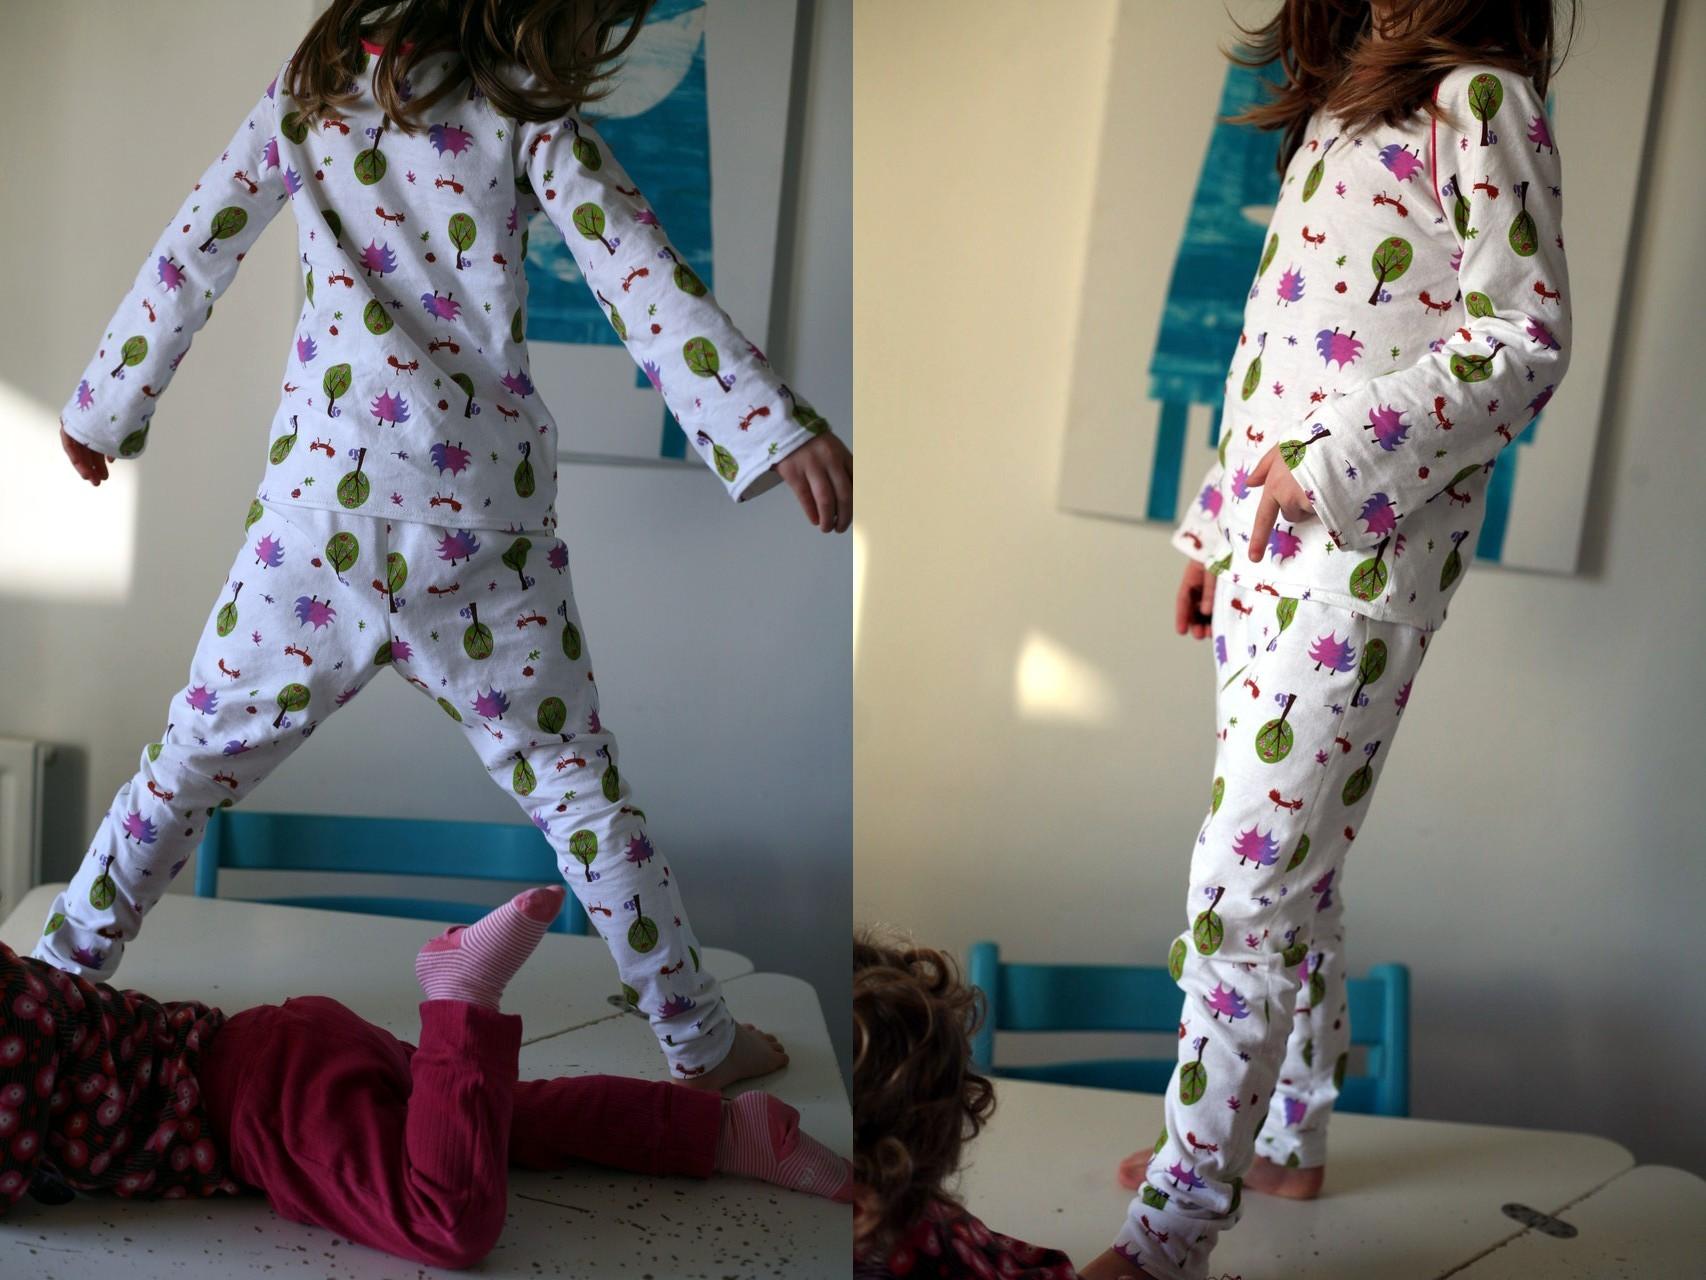 pyjama femme ouvert pyjama be88c85be88c85 personnalise88c85 pas cher. Black Bedroom Furniture Sets. Home Design Ideas